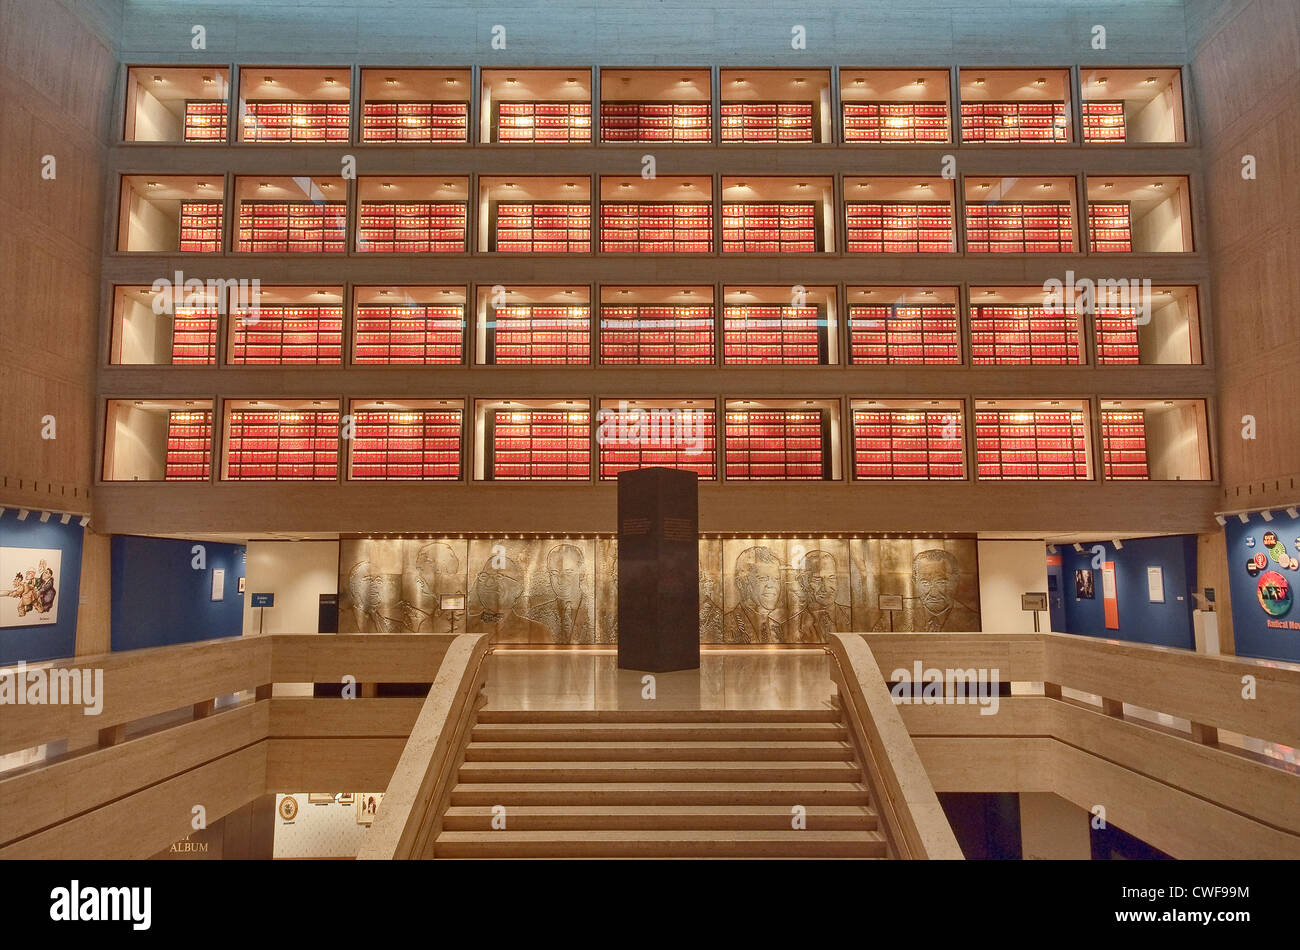 Archiv Abschnitt über Burgsaal Lyndon Baines Johnson Library and Museum (LBJ Library) in Austin, Texas, USA Stockbild